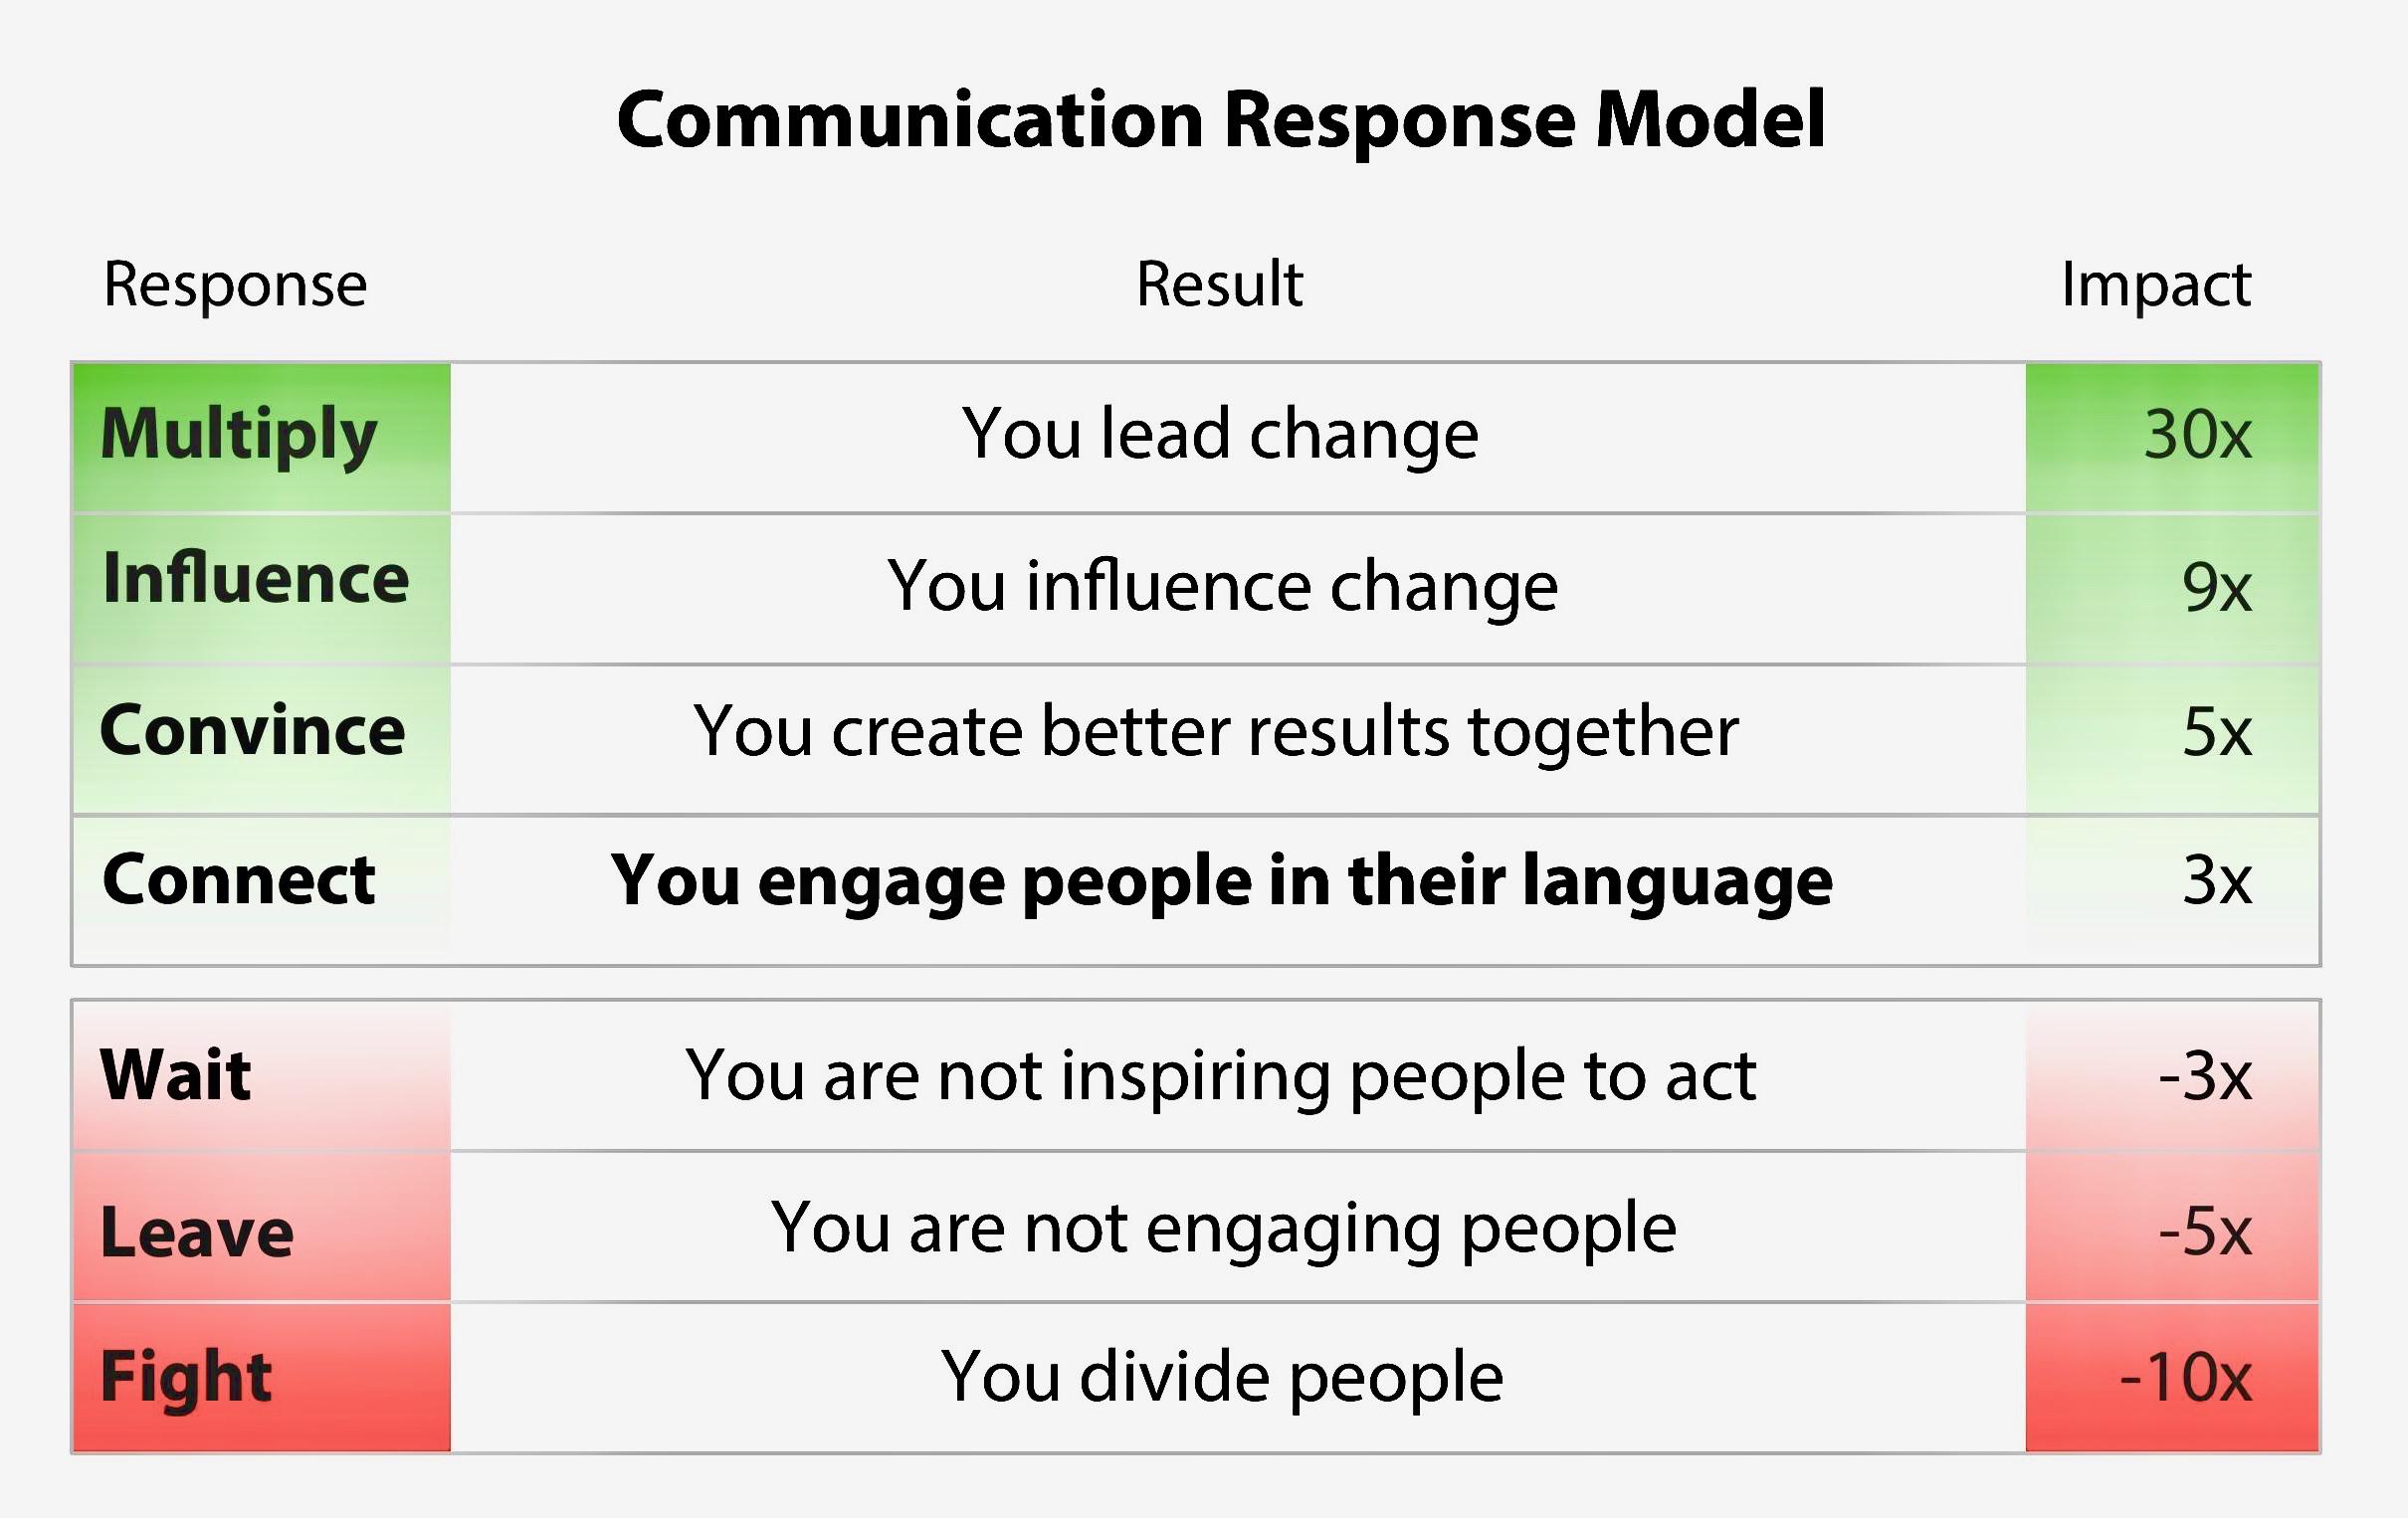 Figure 1. The Communication Response Model.